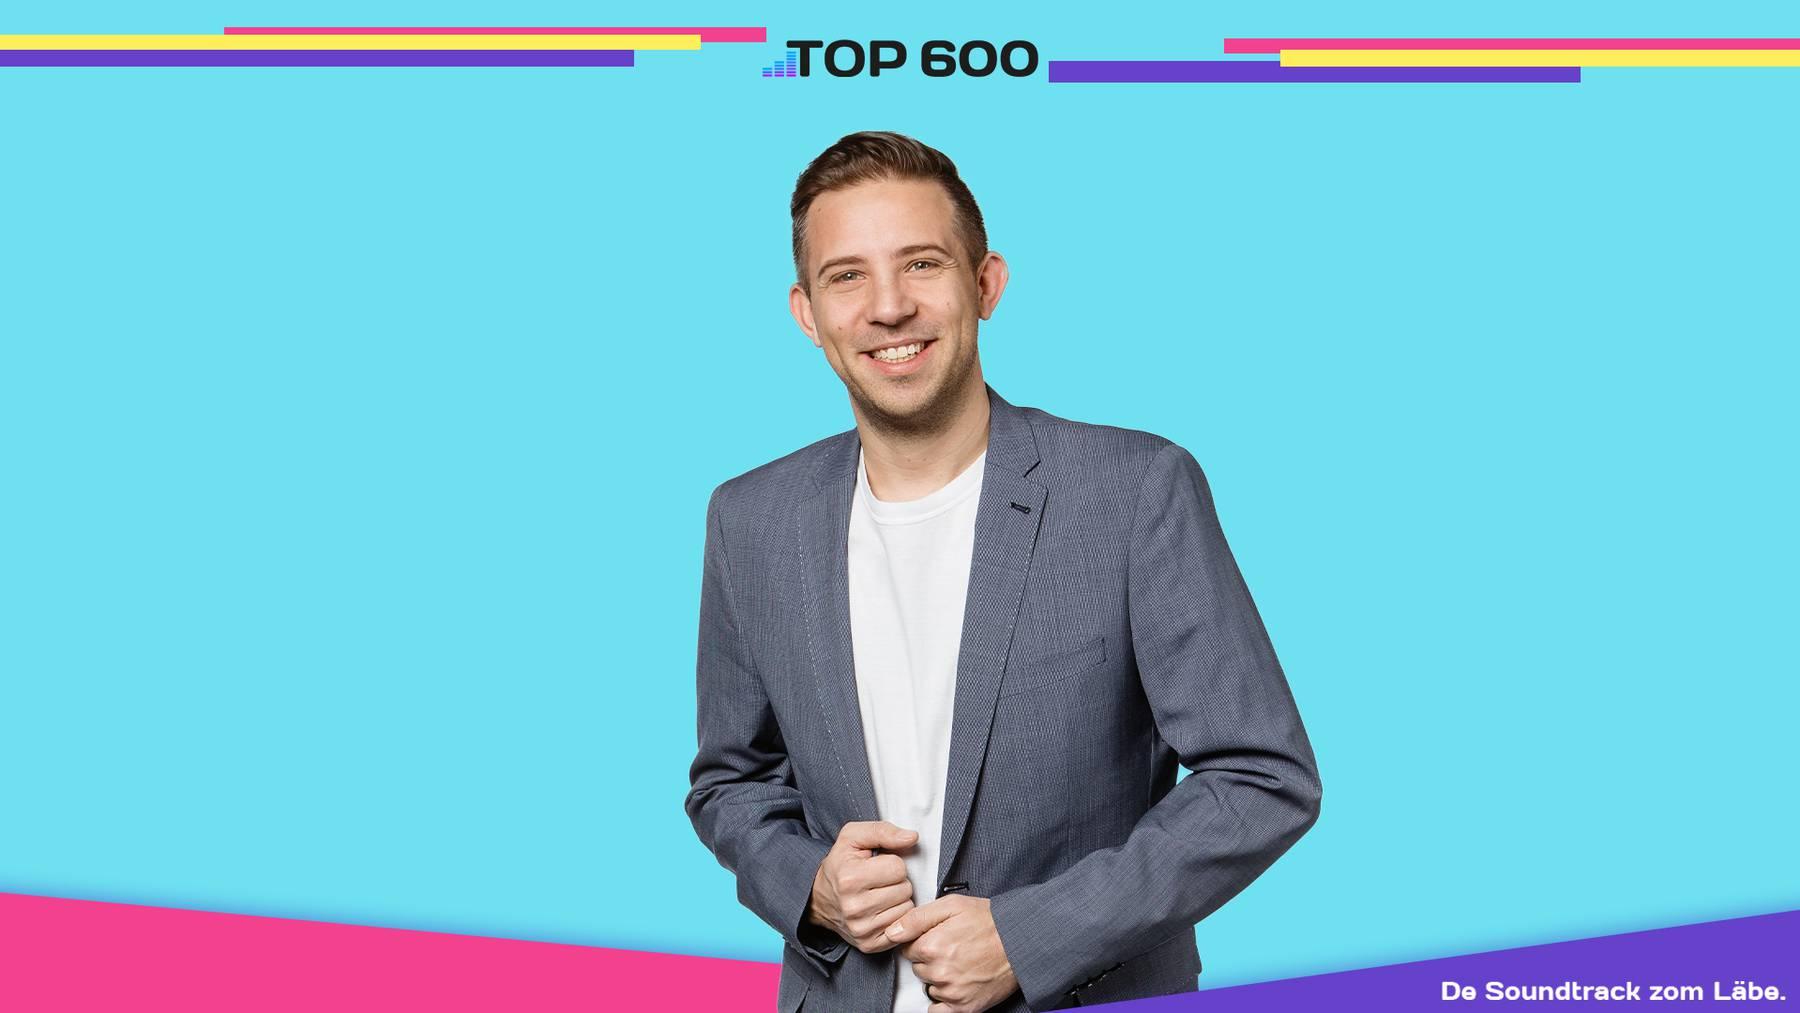 Asset Marius Top 600